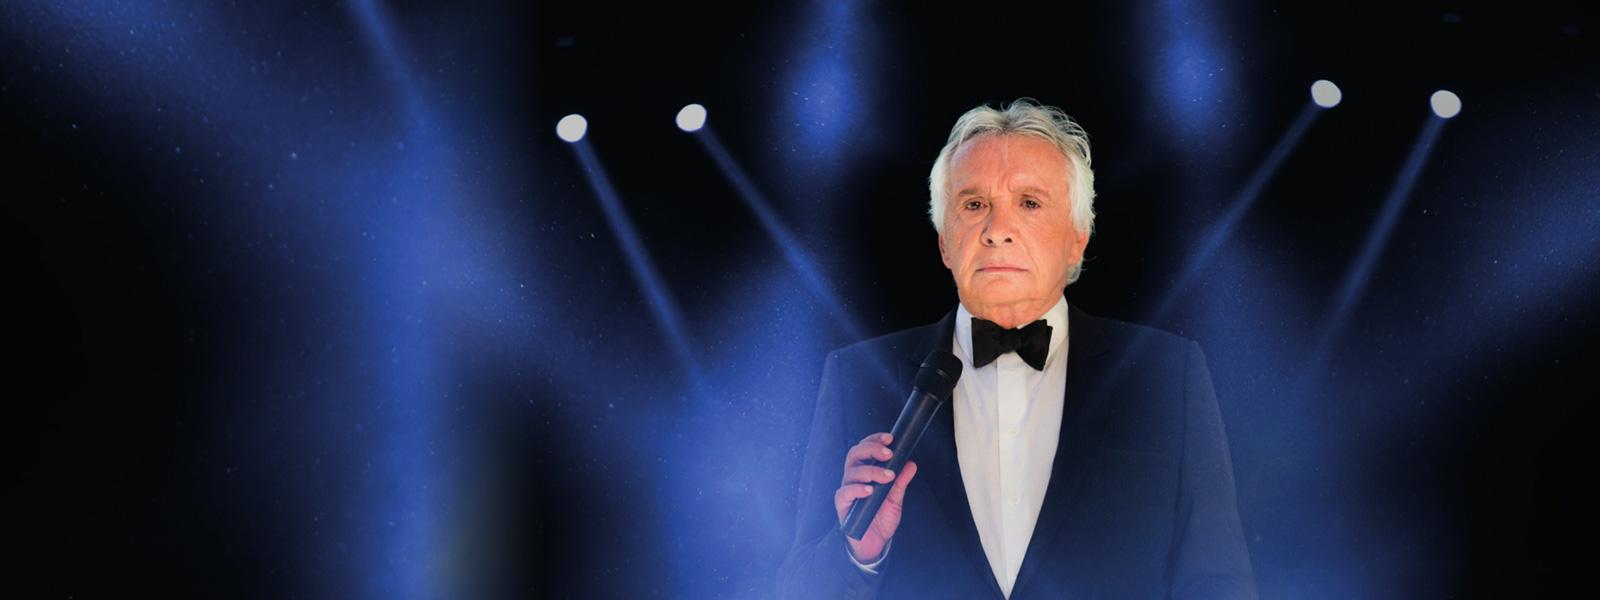 Michel Sardou concert